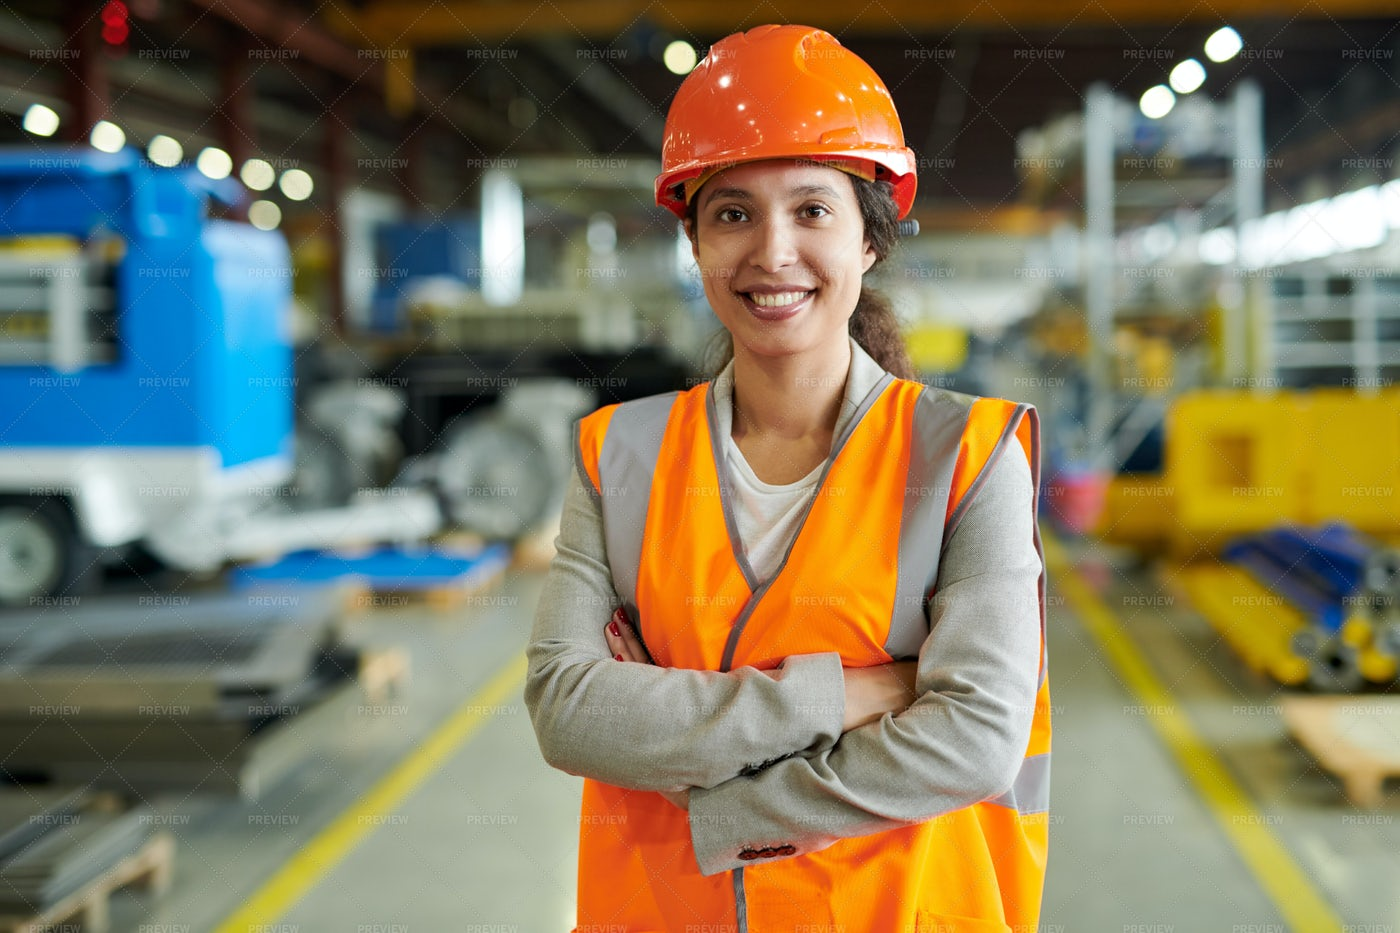 Confident Factory Worker Posing: Stock Photos